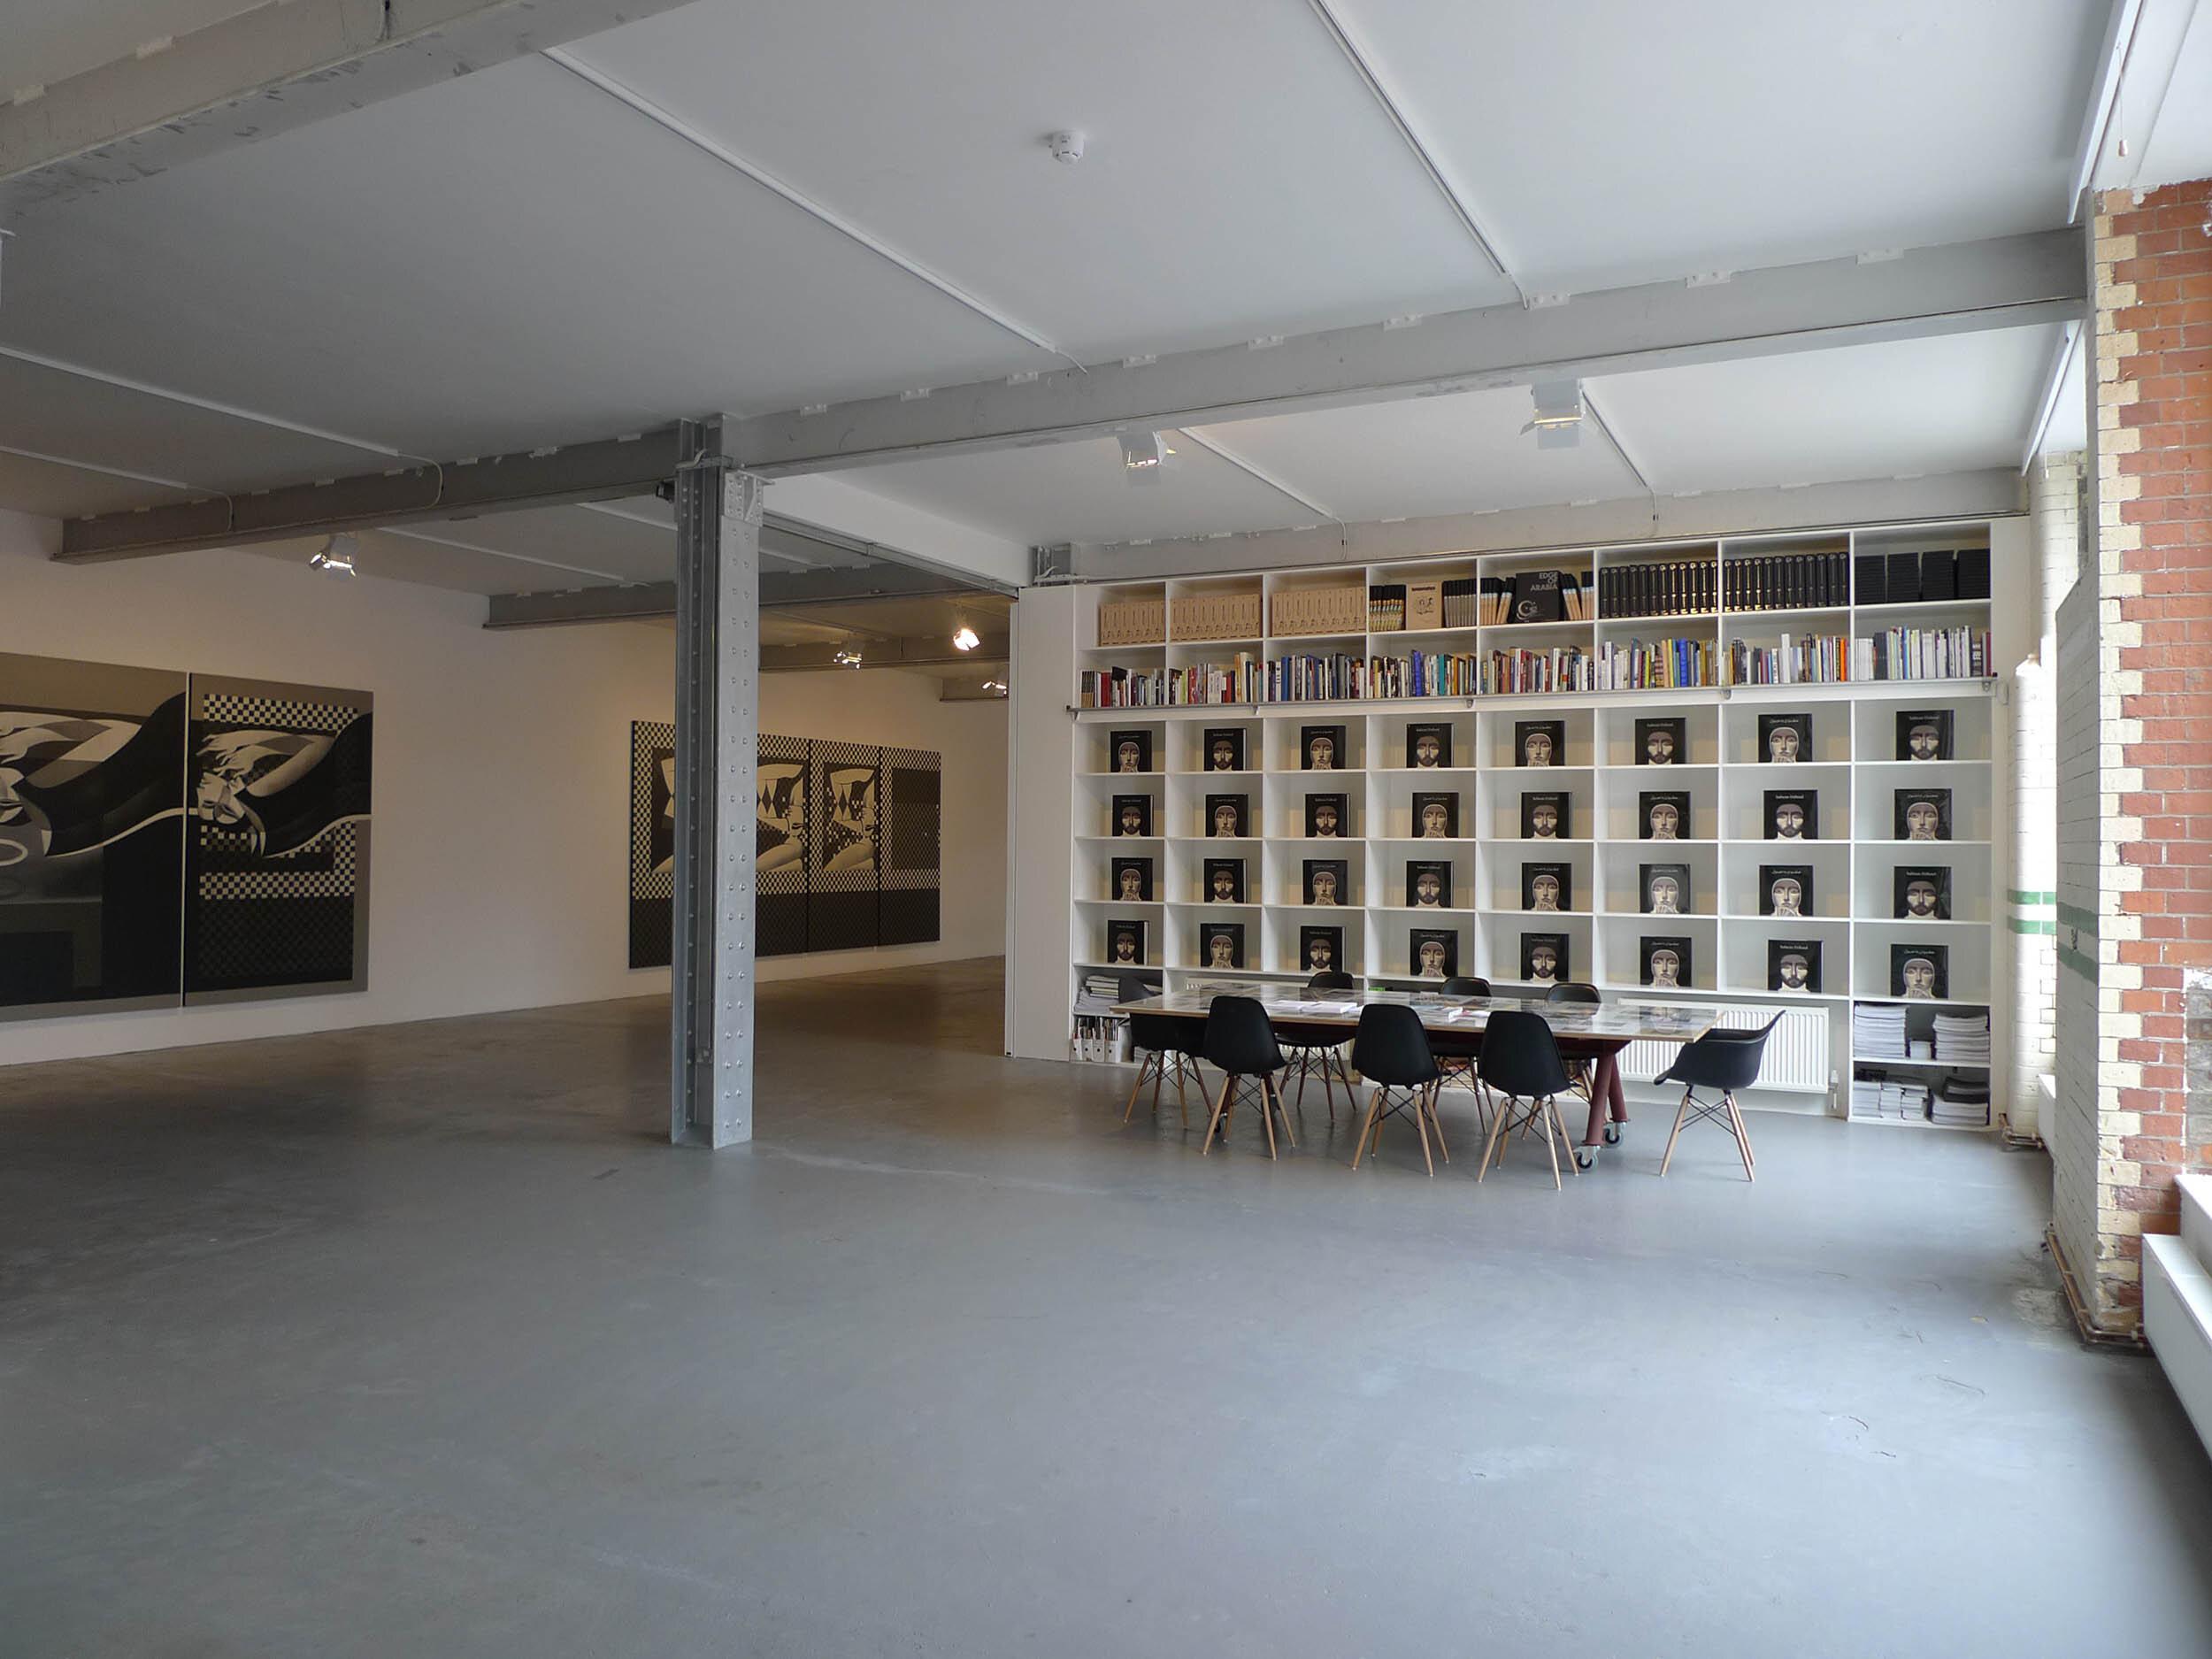 Edge of Arabia Gallery @ Testbed 1 London aLL Design (5).JPG